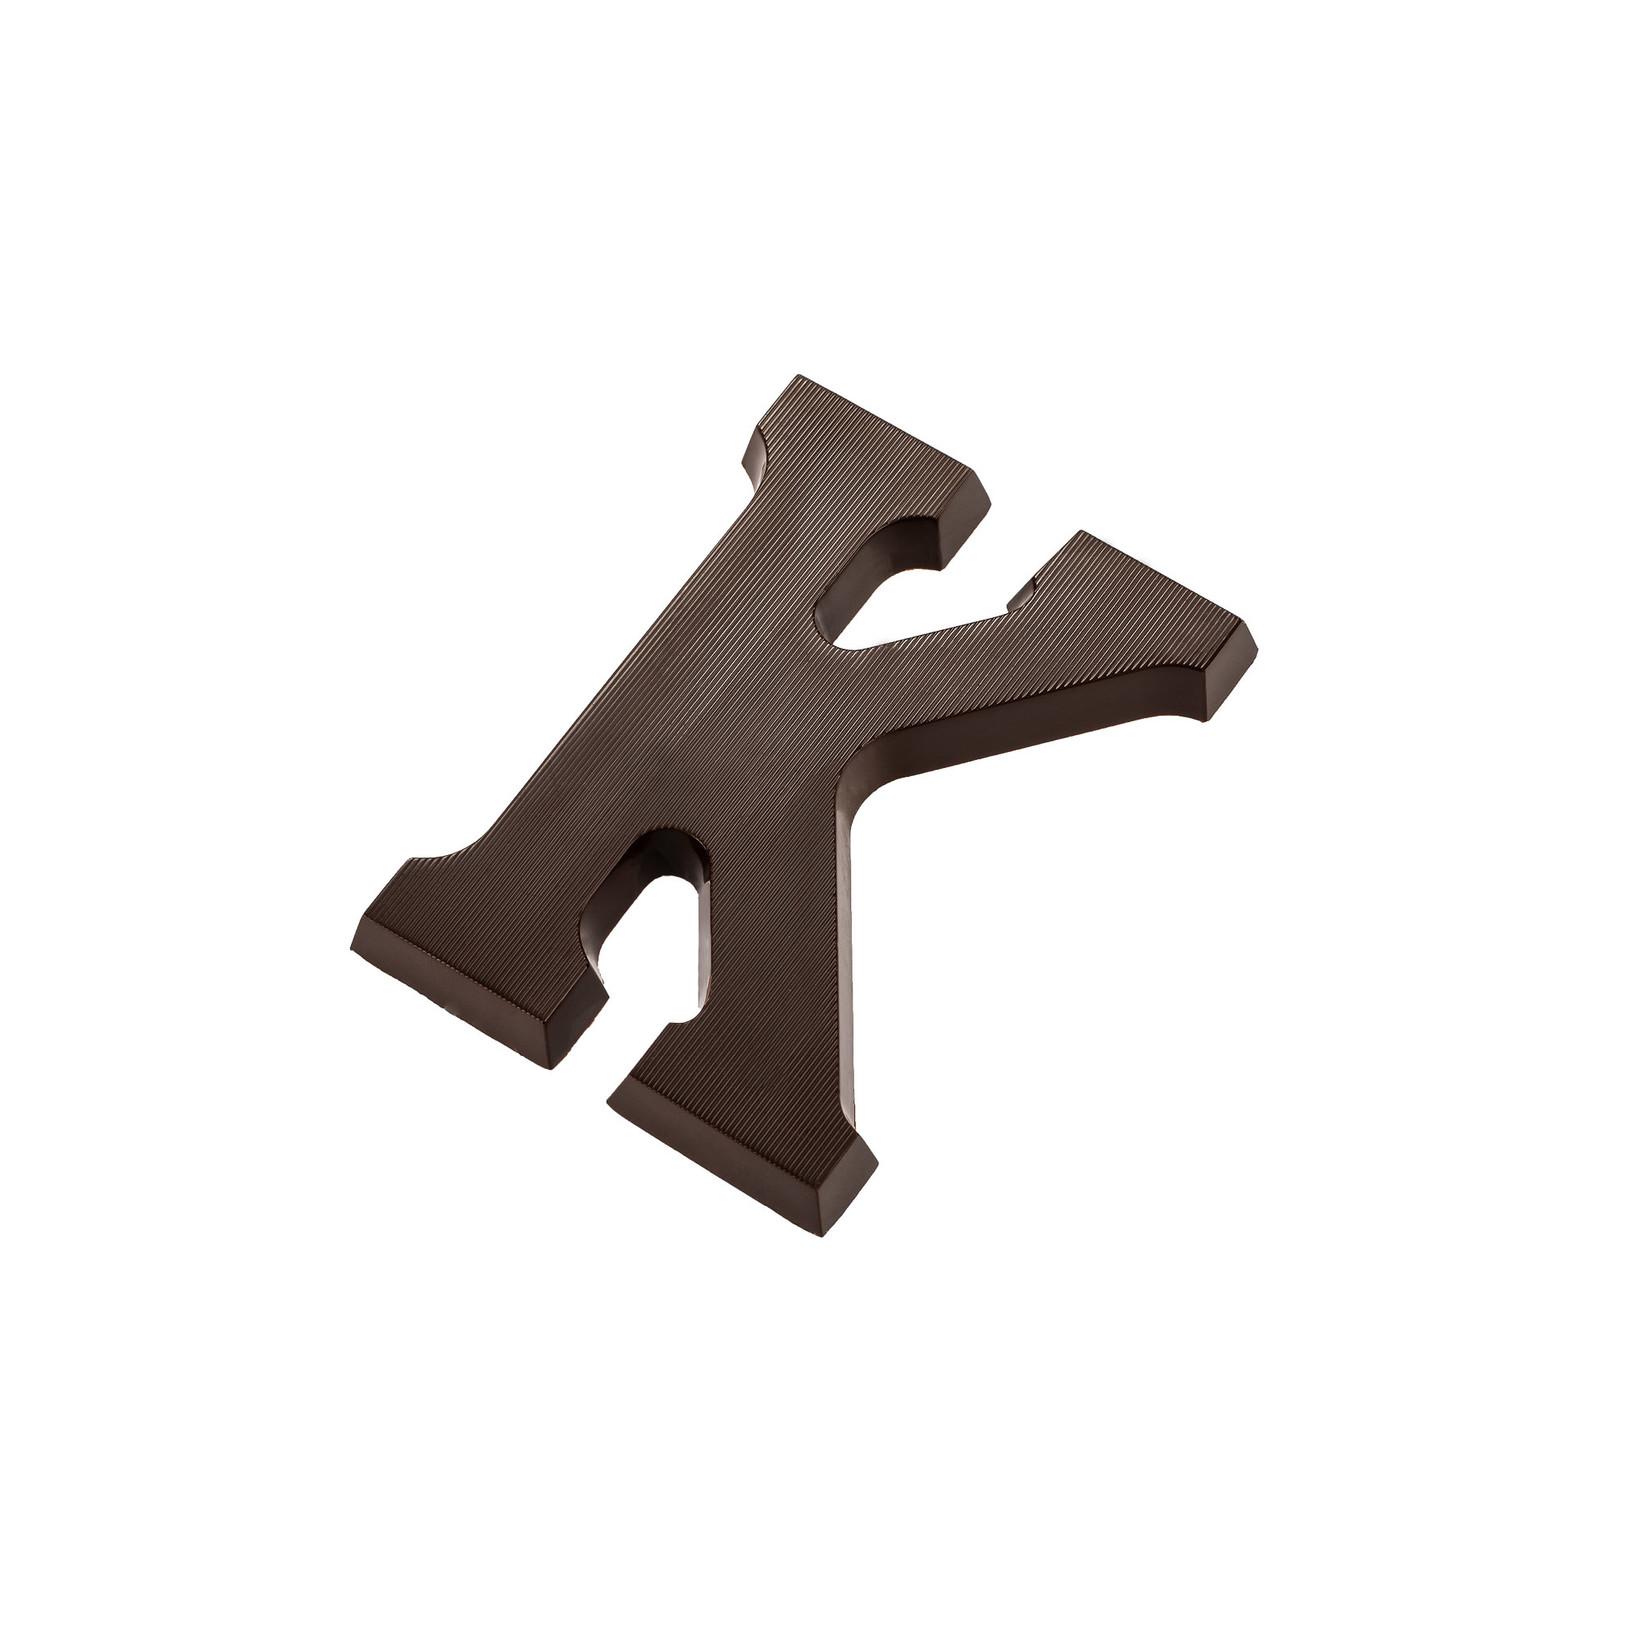 Chocolate letter -  Dark Chocolate